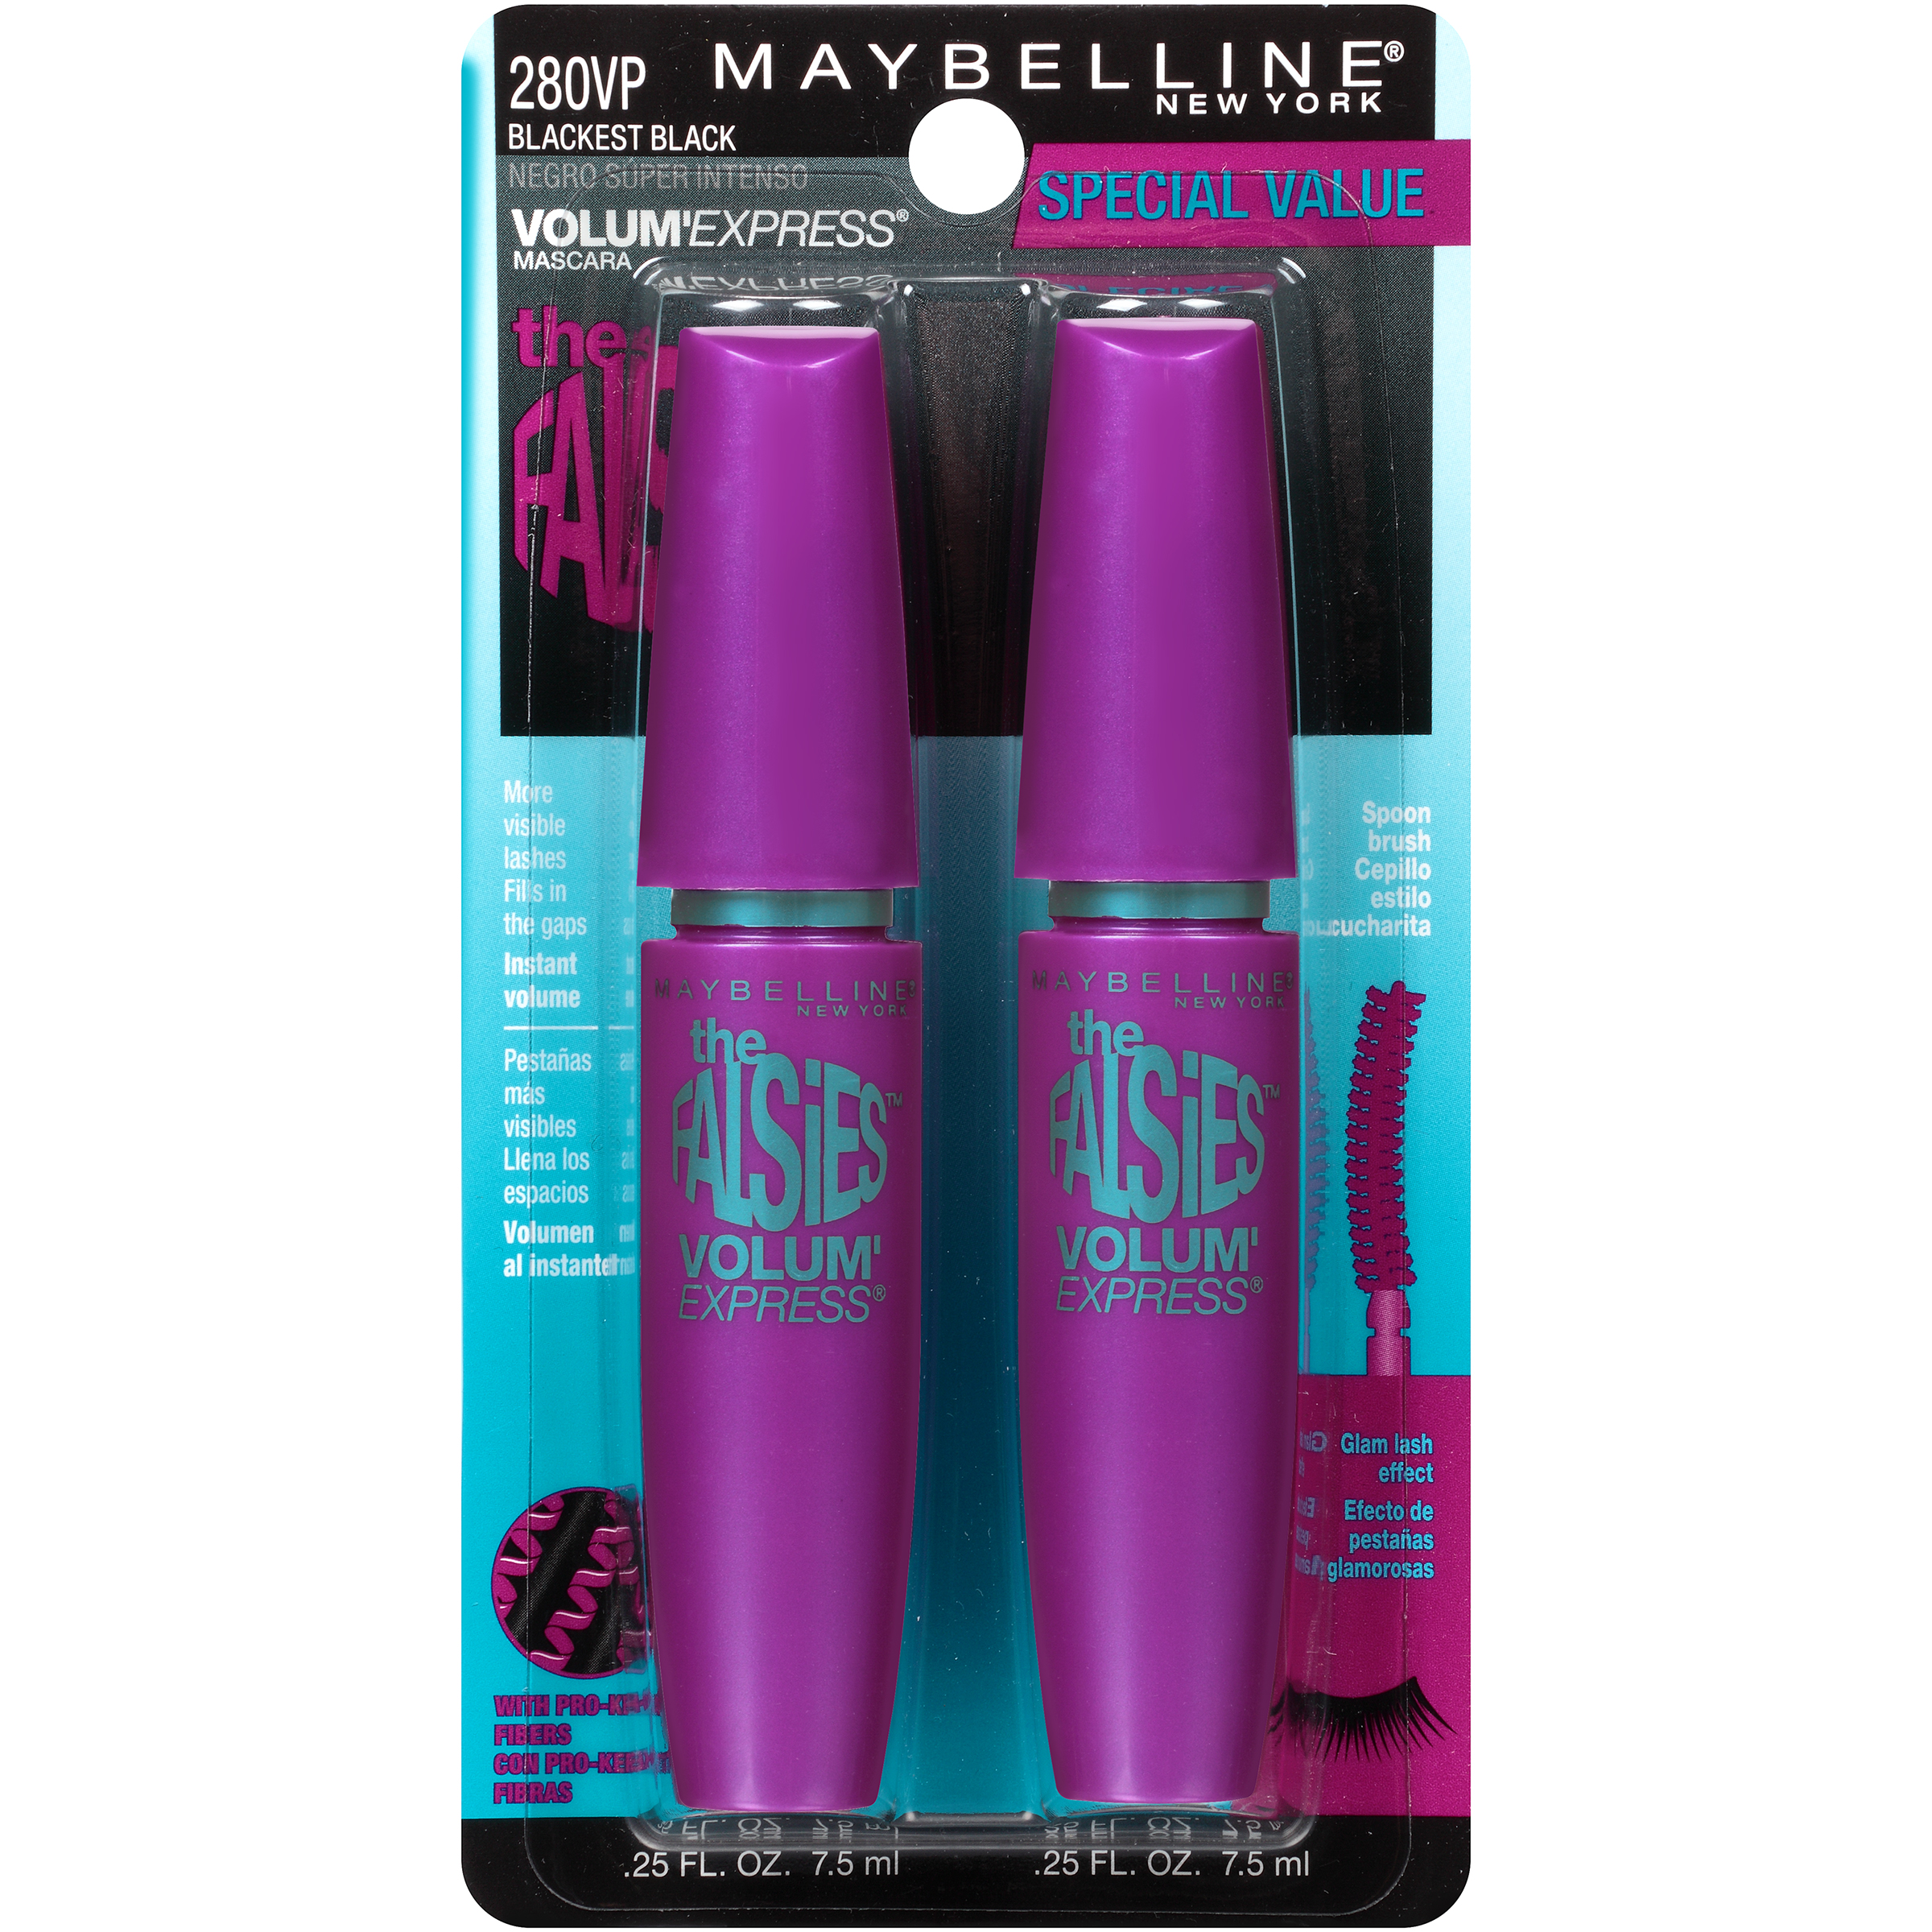 Maybelline New York Volum' Express Falsies Washable Mascara 280VP Blackest Black 0.5 fl. oz.